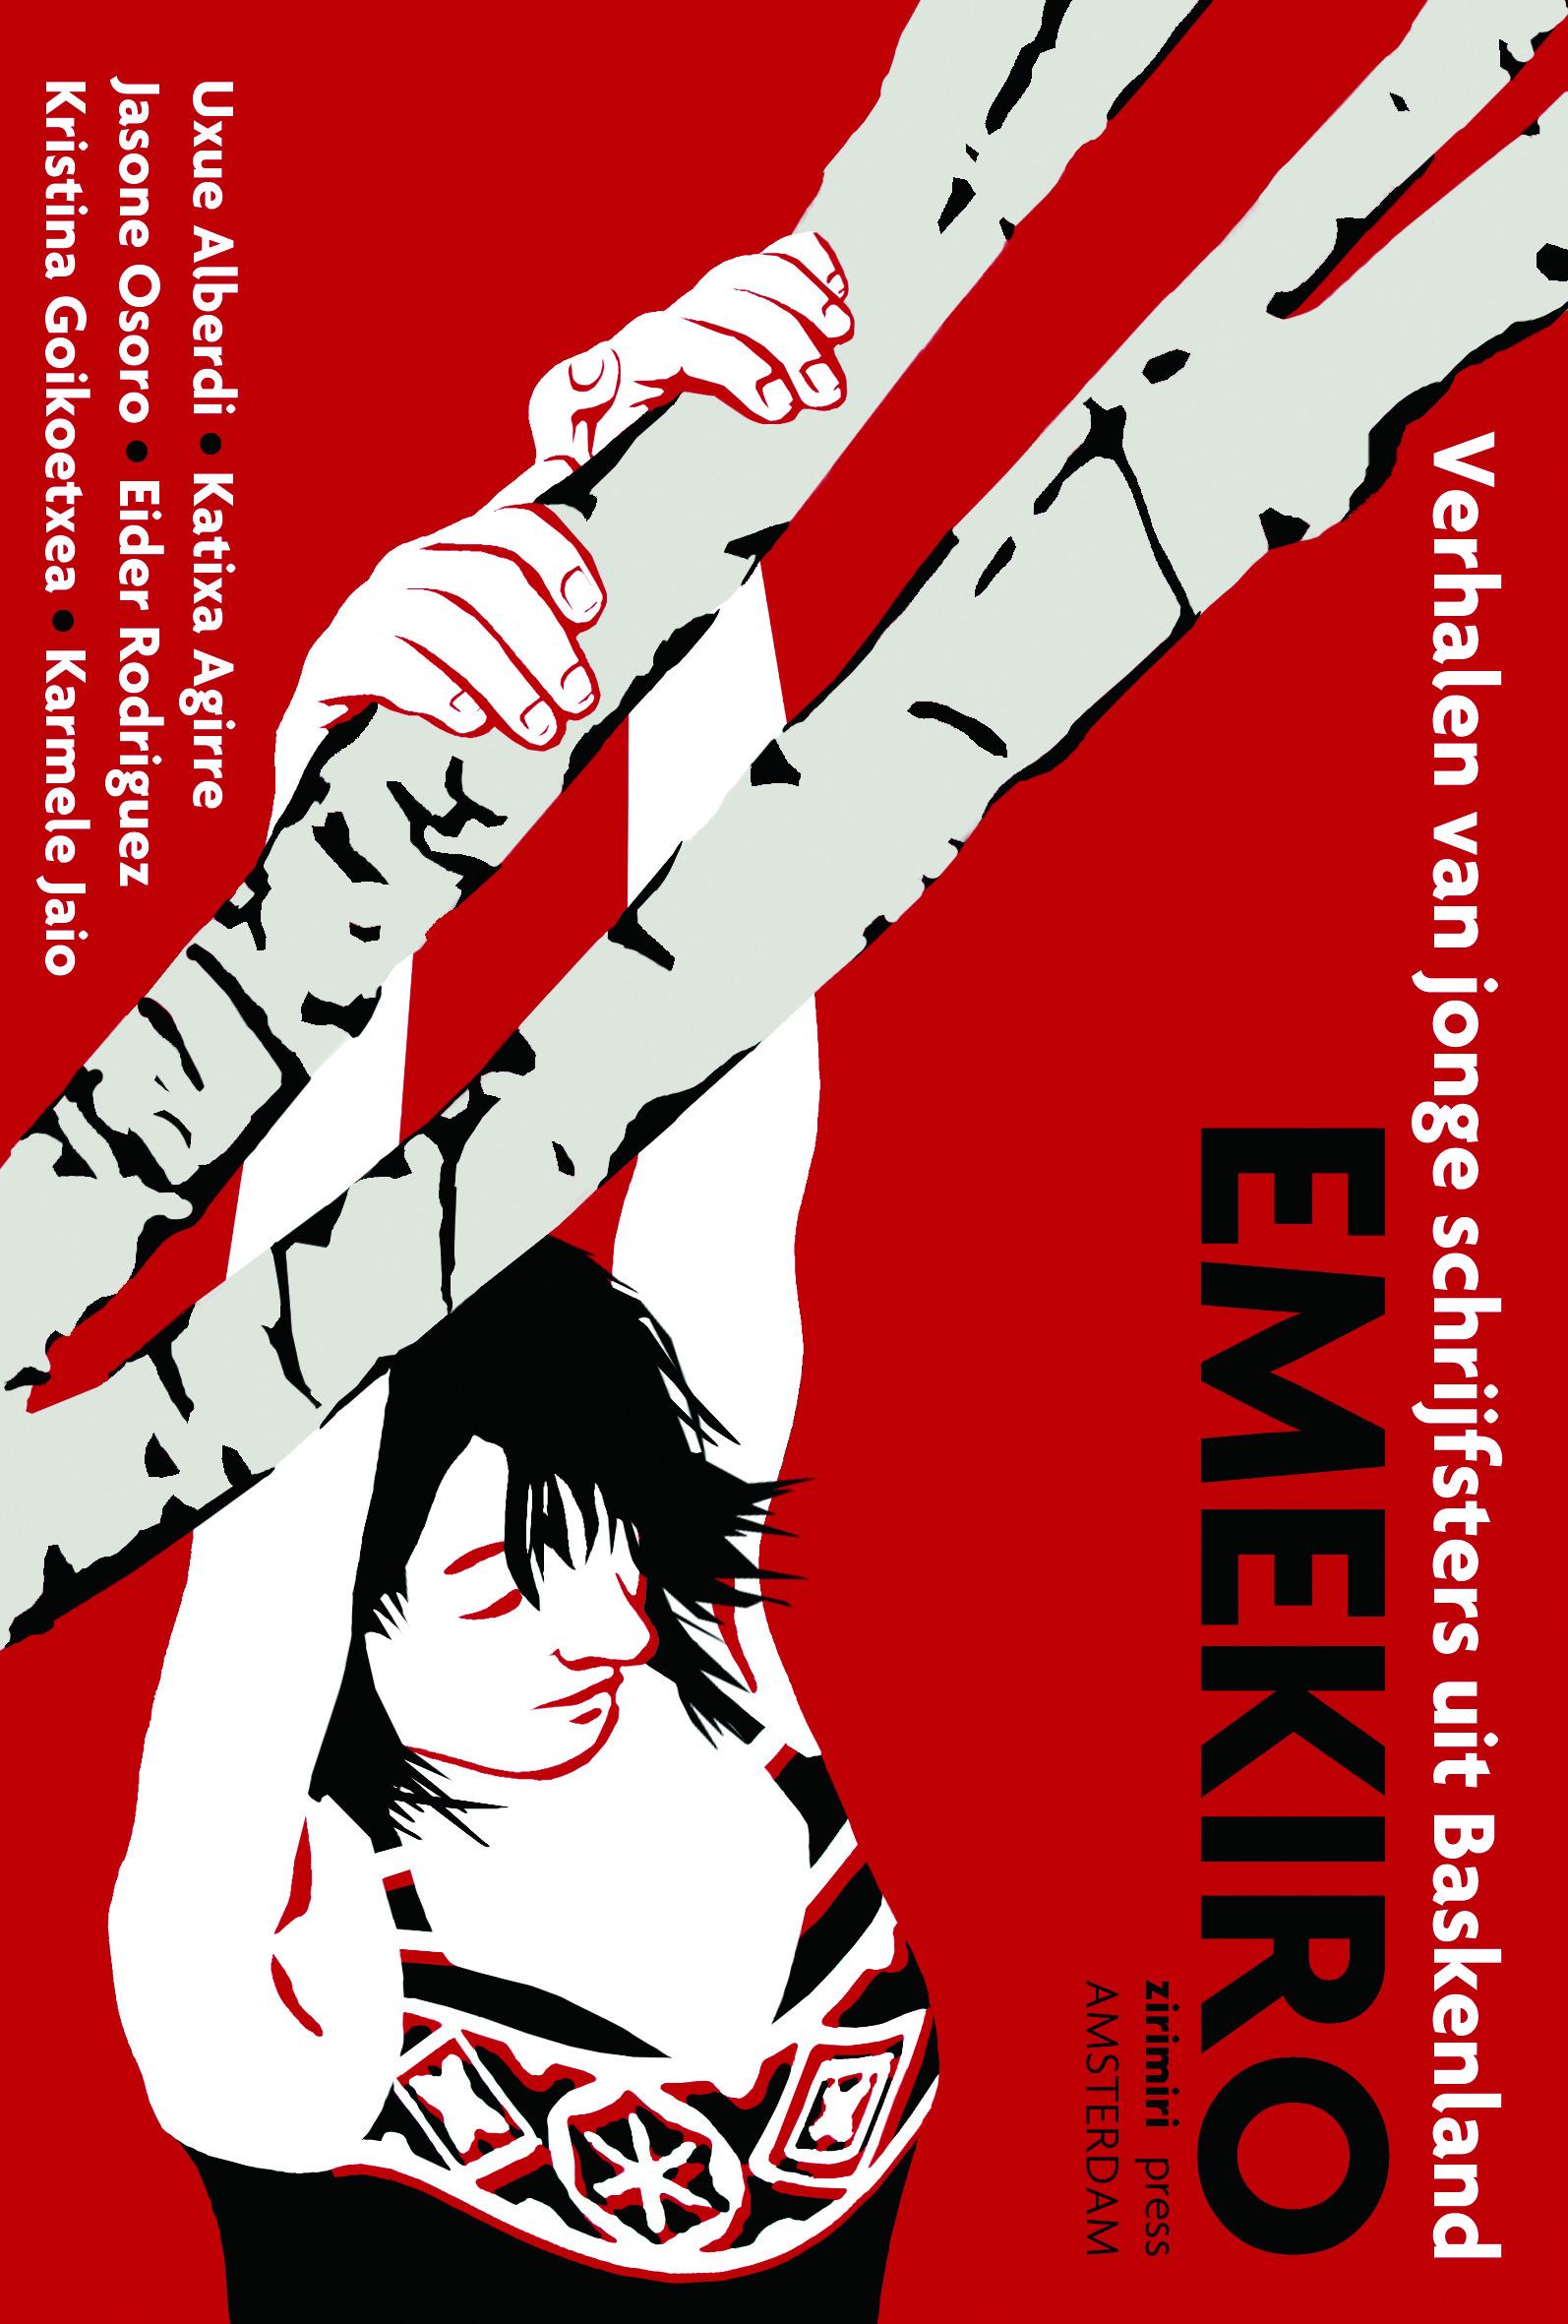 Emekiro Verhalenbundel